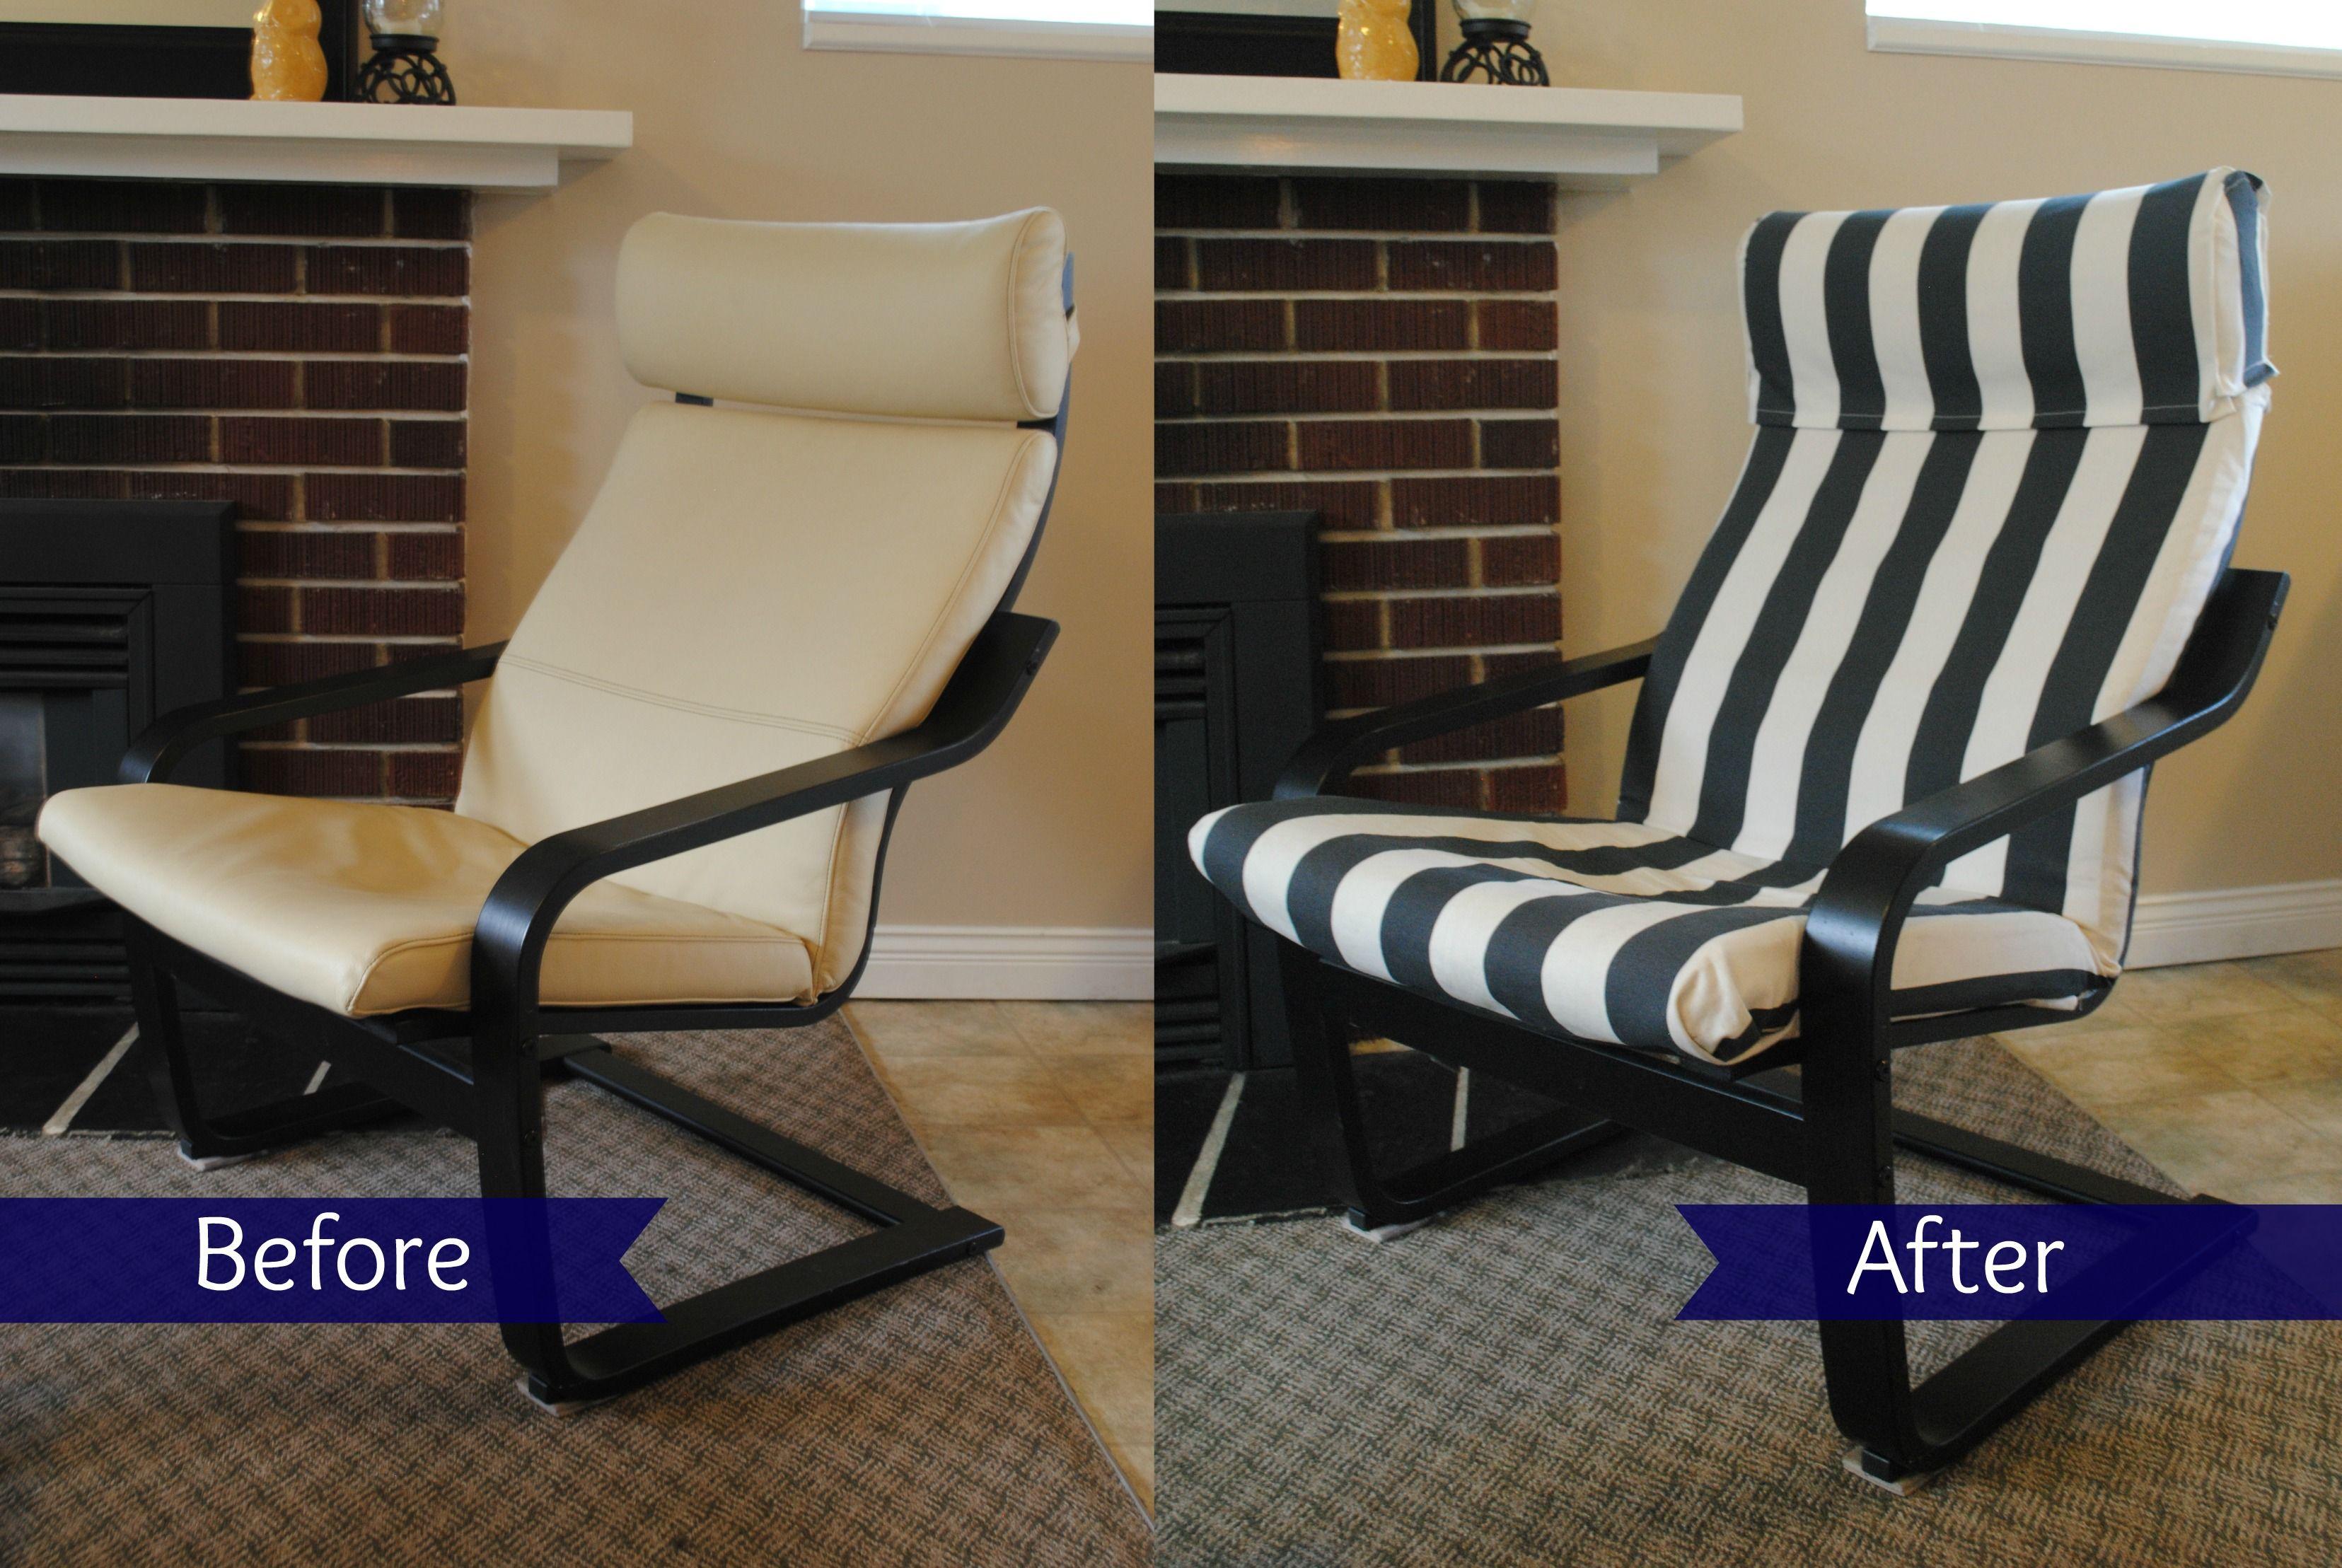 Ikea Hack Poang Chair Recover Ikea Rocking Chair Ikea Poang Chair Slipcovers For Chairs